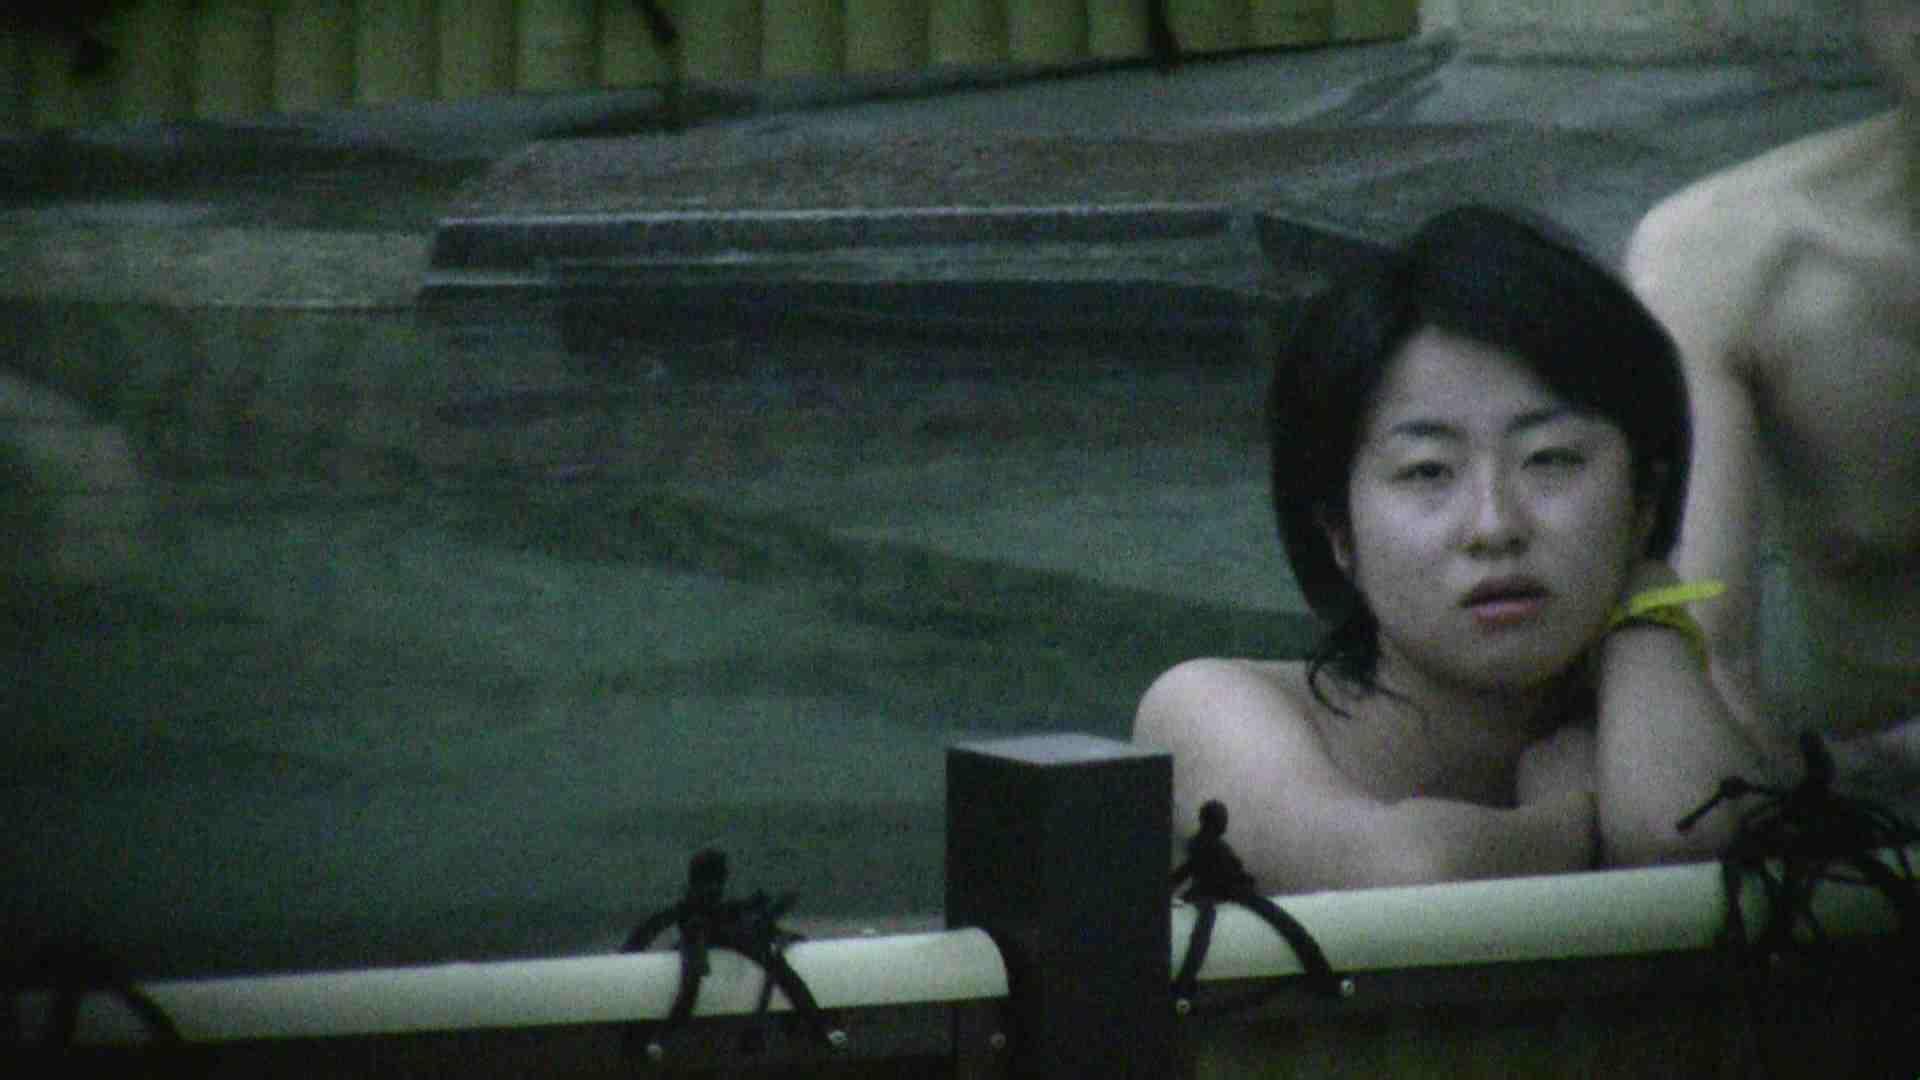 Aquaな露天風呂Vol.112 盗撮シリーズ   露天風呂編  93PIX 63